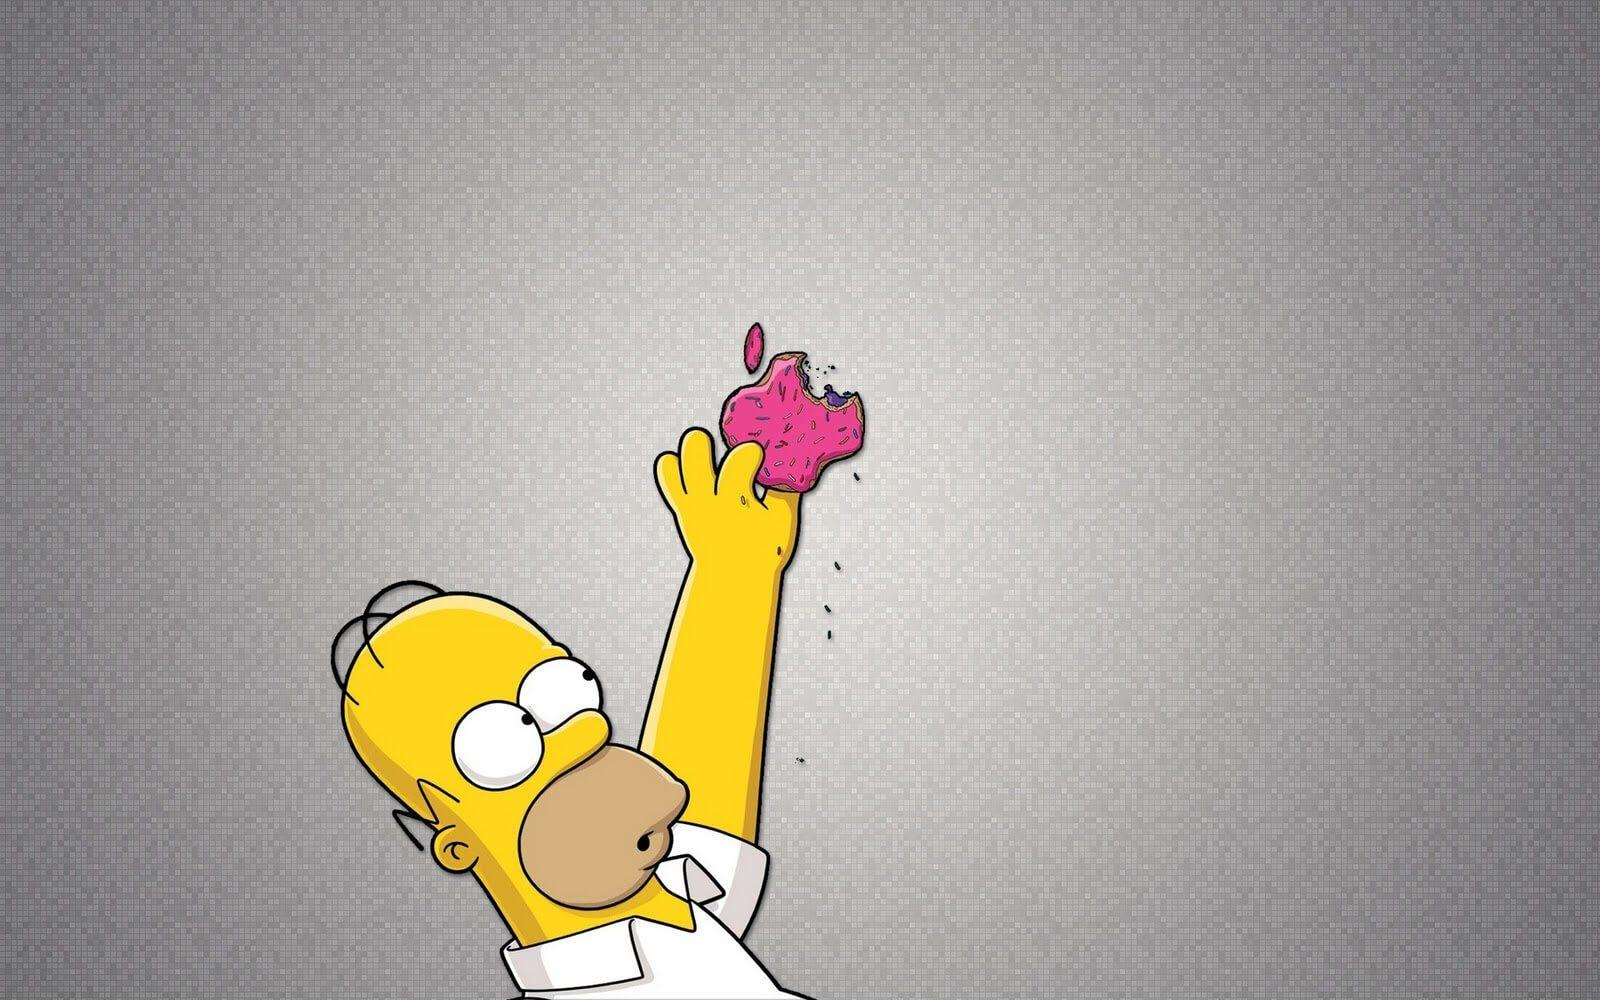 The Simpsons Wallpaper Apple | HD4Wallpaper.net